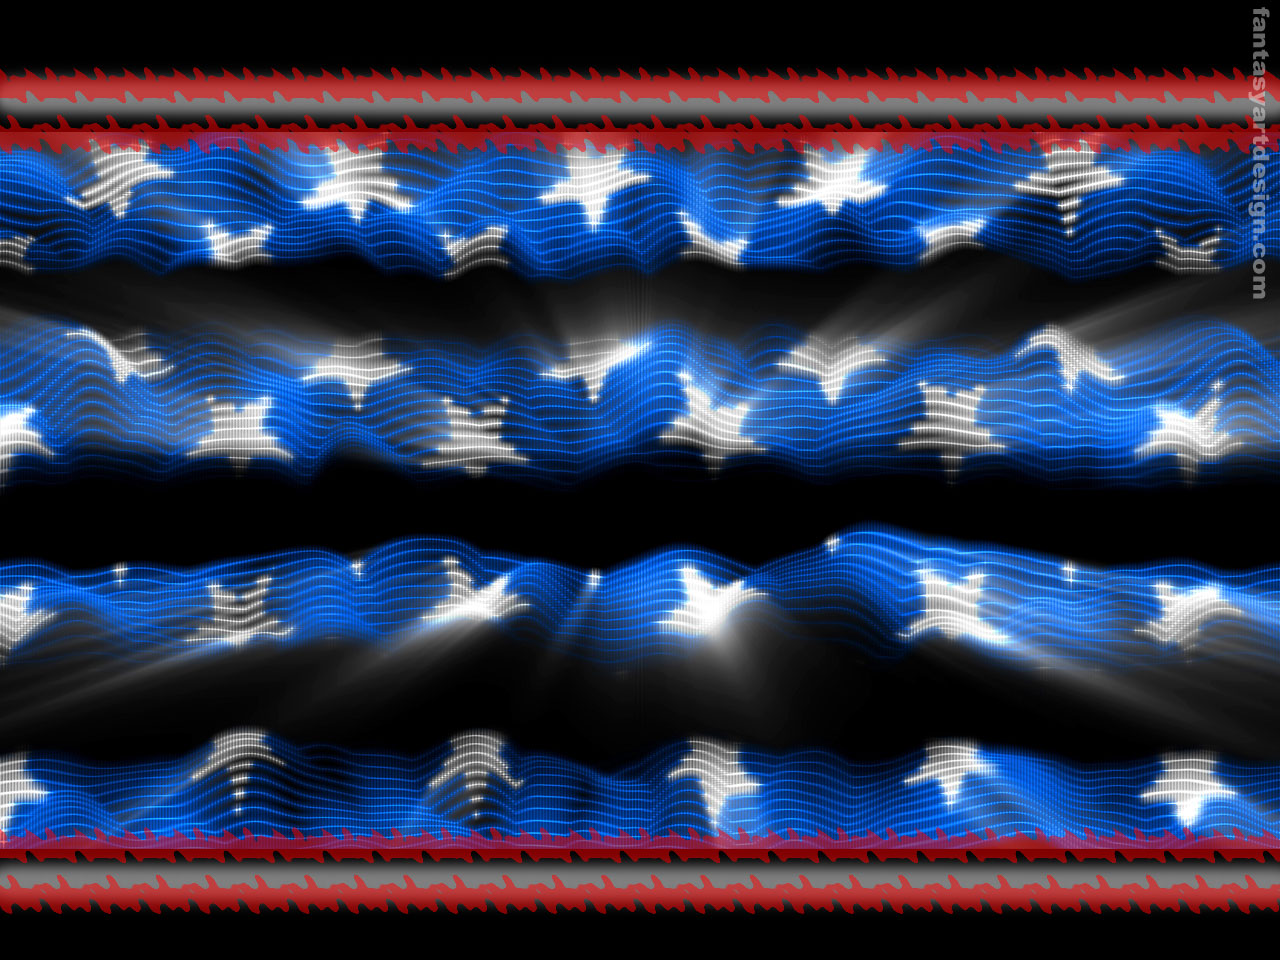 computer desktop wallpaperAmerican flag stars wallpaper Photo 1280x960